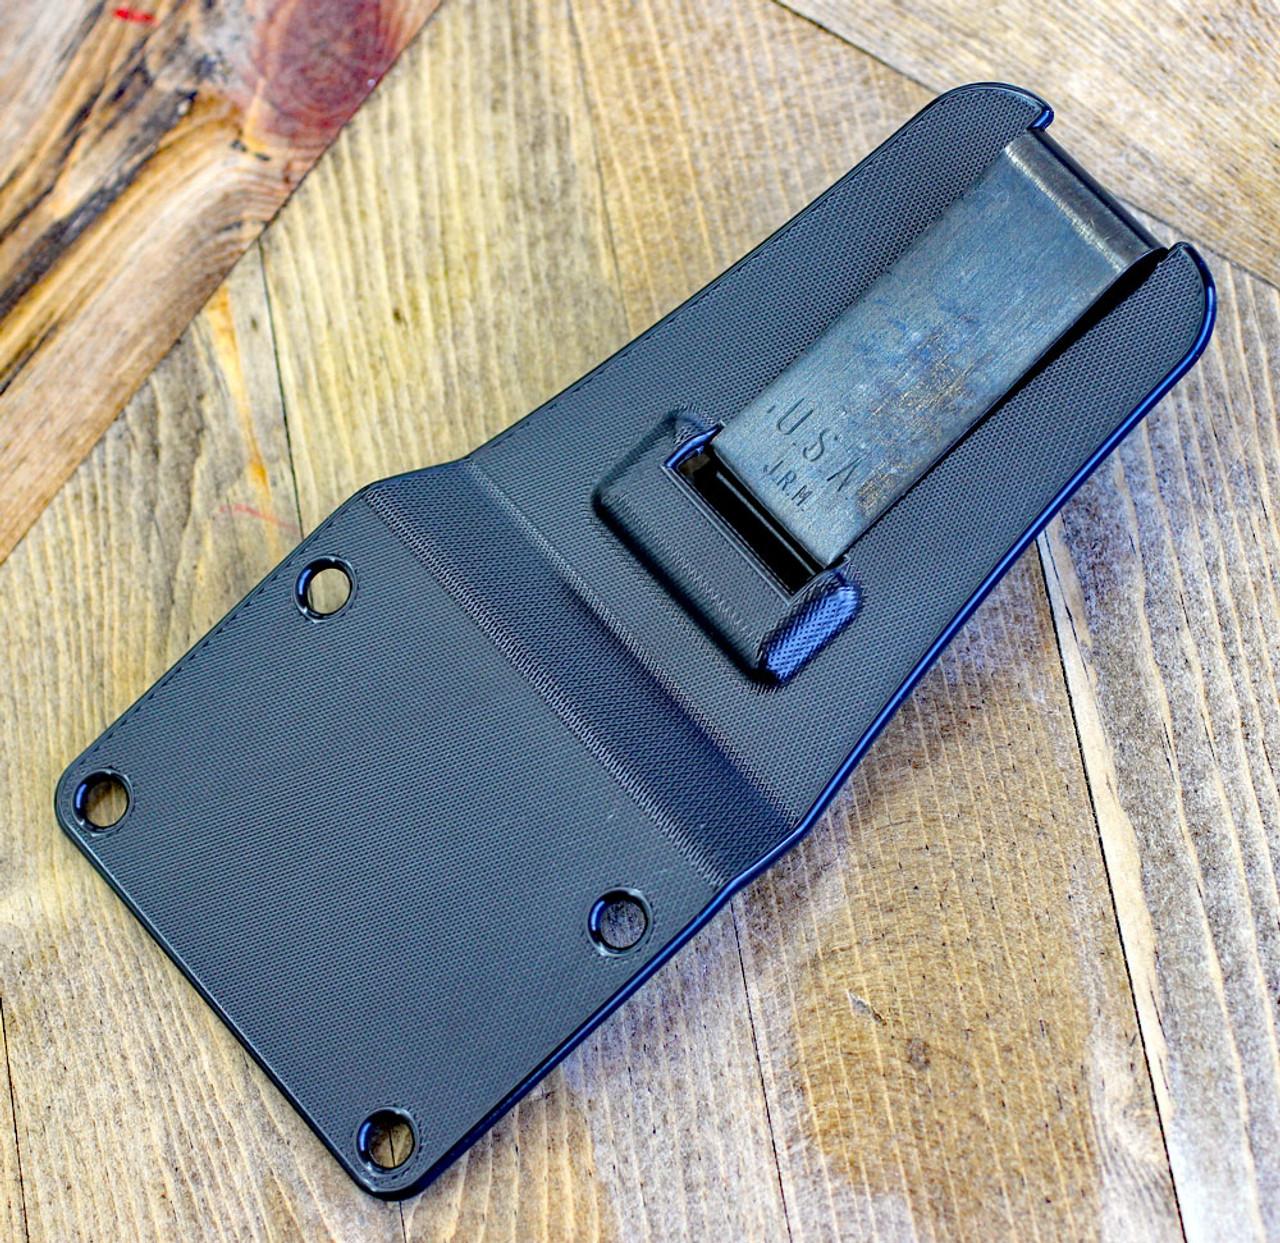 "ESEE-6 6PB-011, 5.75"" 1095 Carbon Steel Black Plain Blade, Natural Canvas Micarta 3D Handle, Black Molded Sheath"